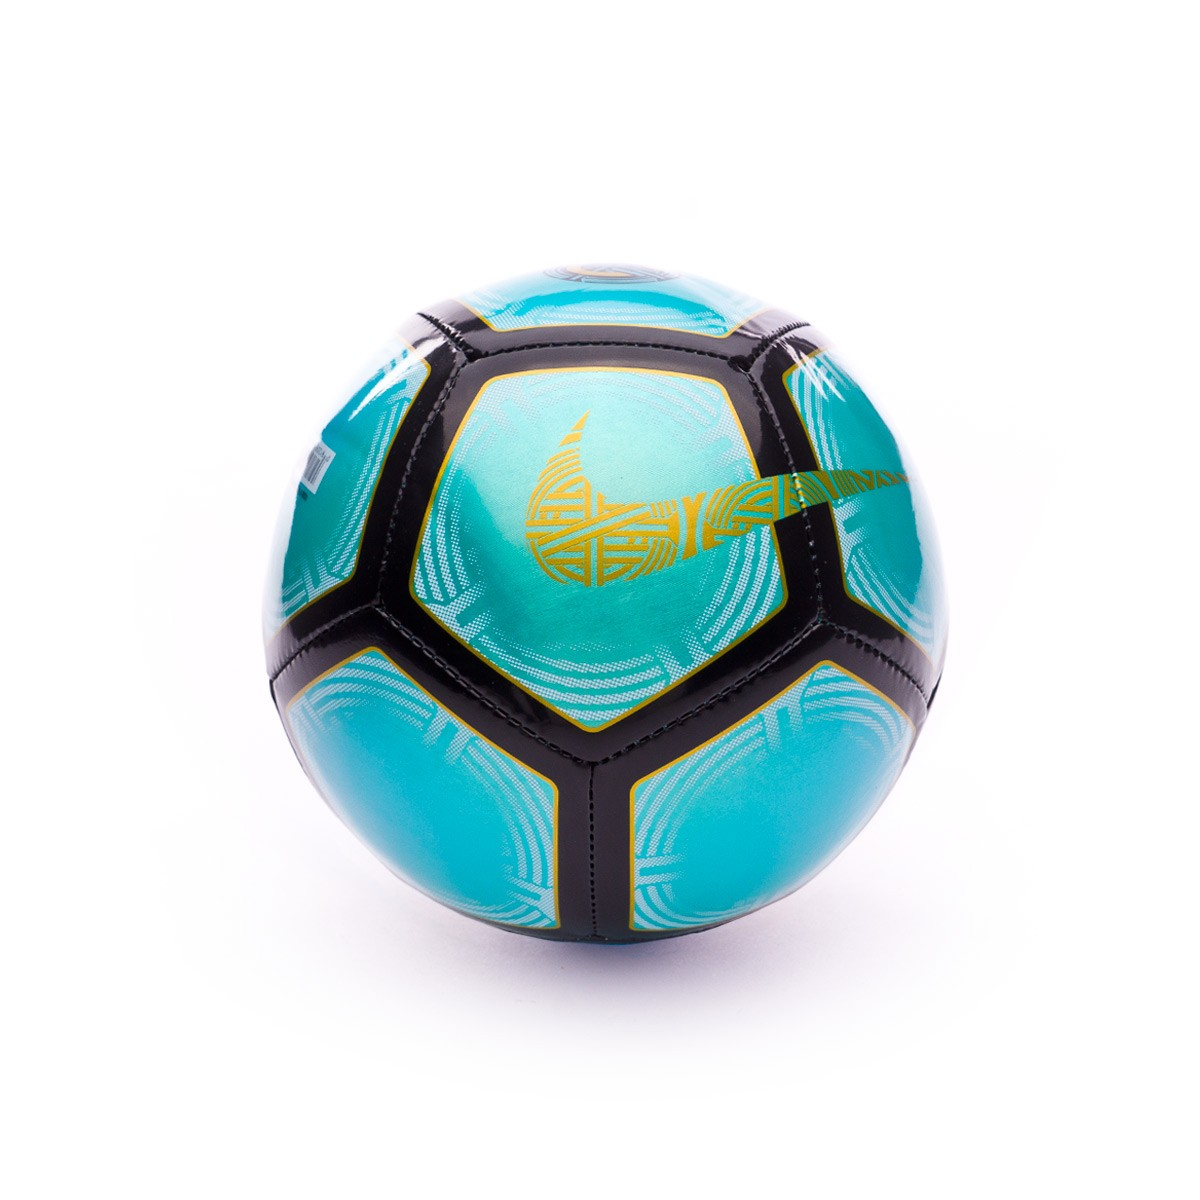 Bola de Futebol Nike Mini CR7 Skills Clear emerald-Black-Gold - Loja ... 0e49caebf76bb